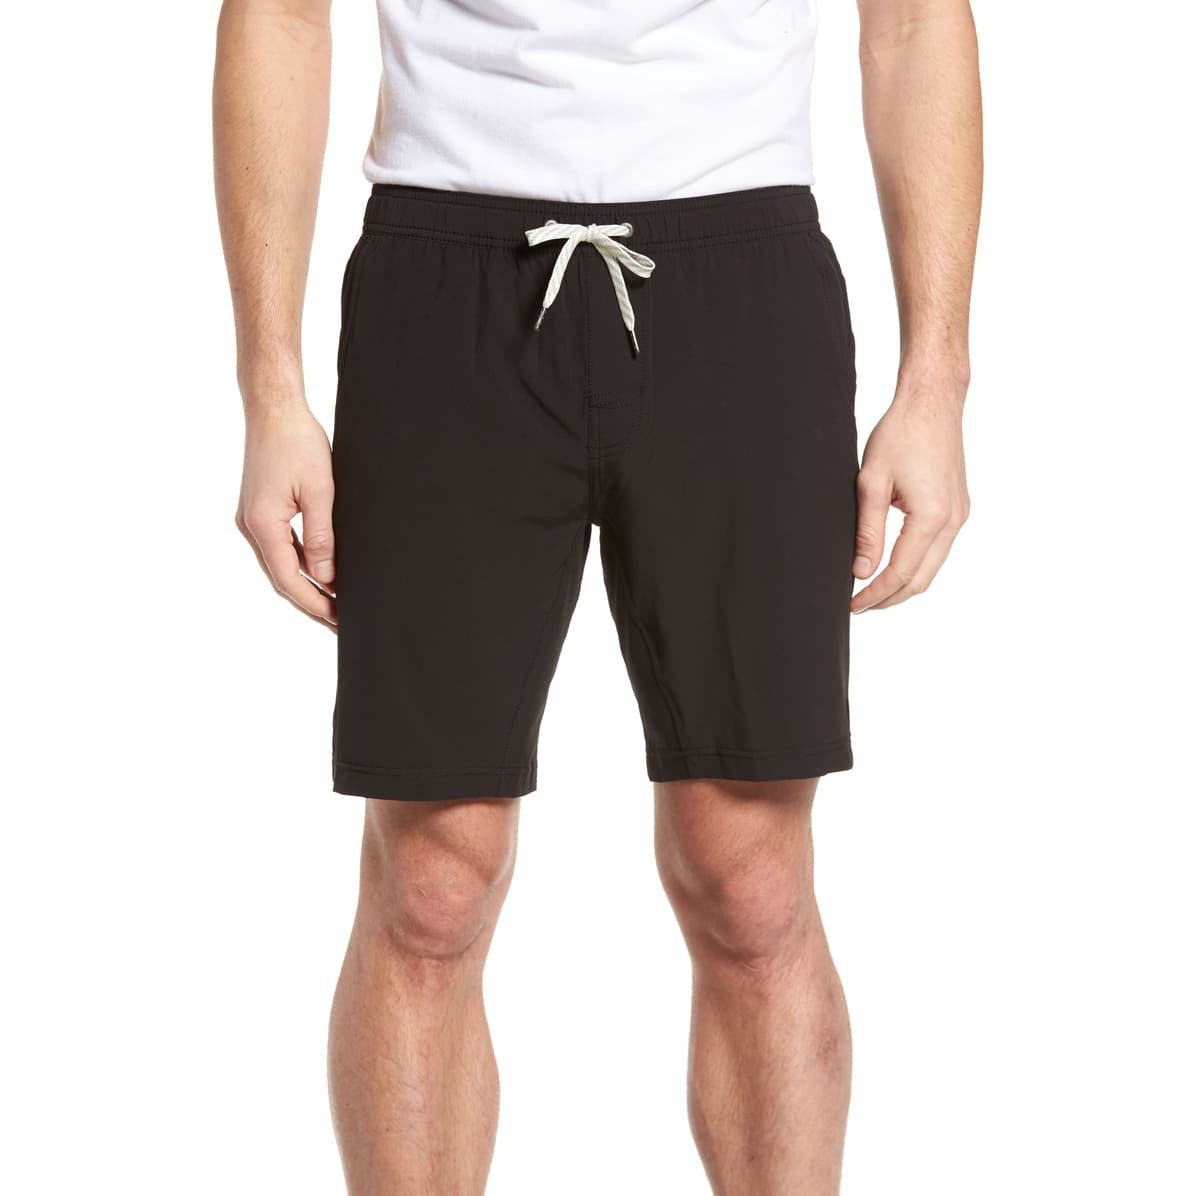 vuori Kore Shorts, best mens shorts